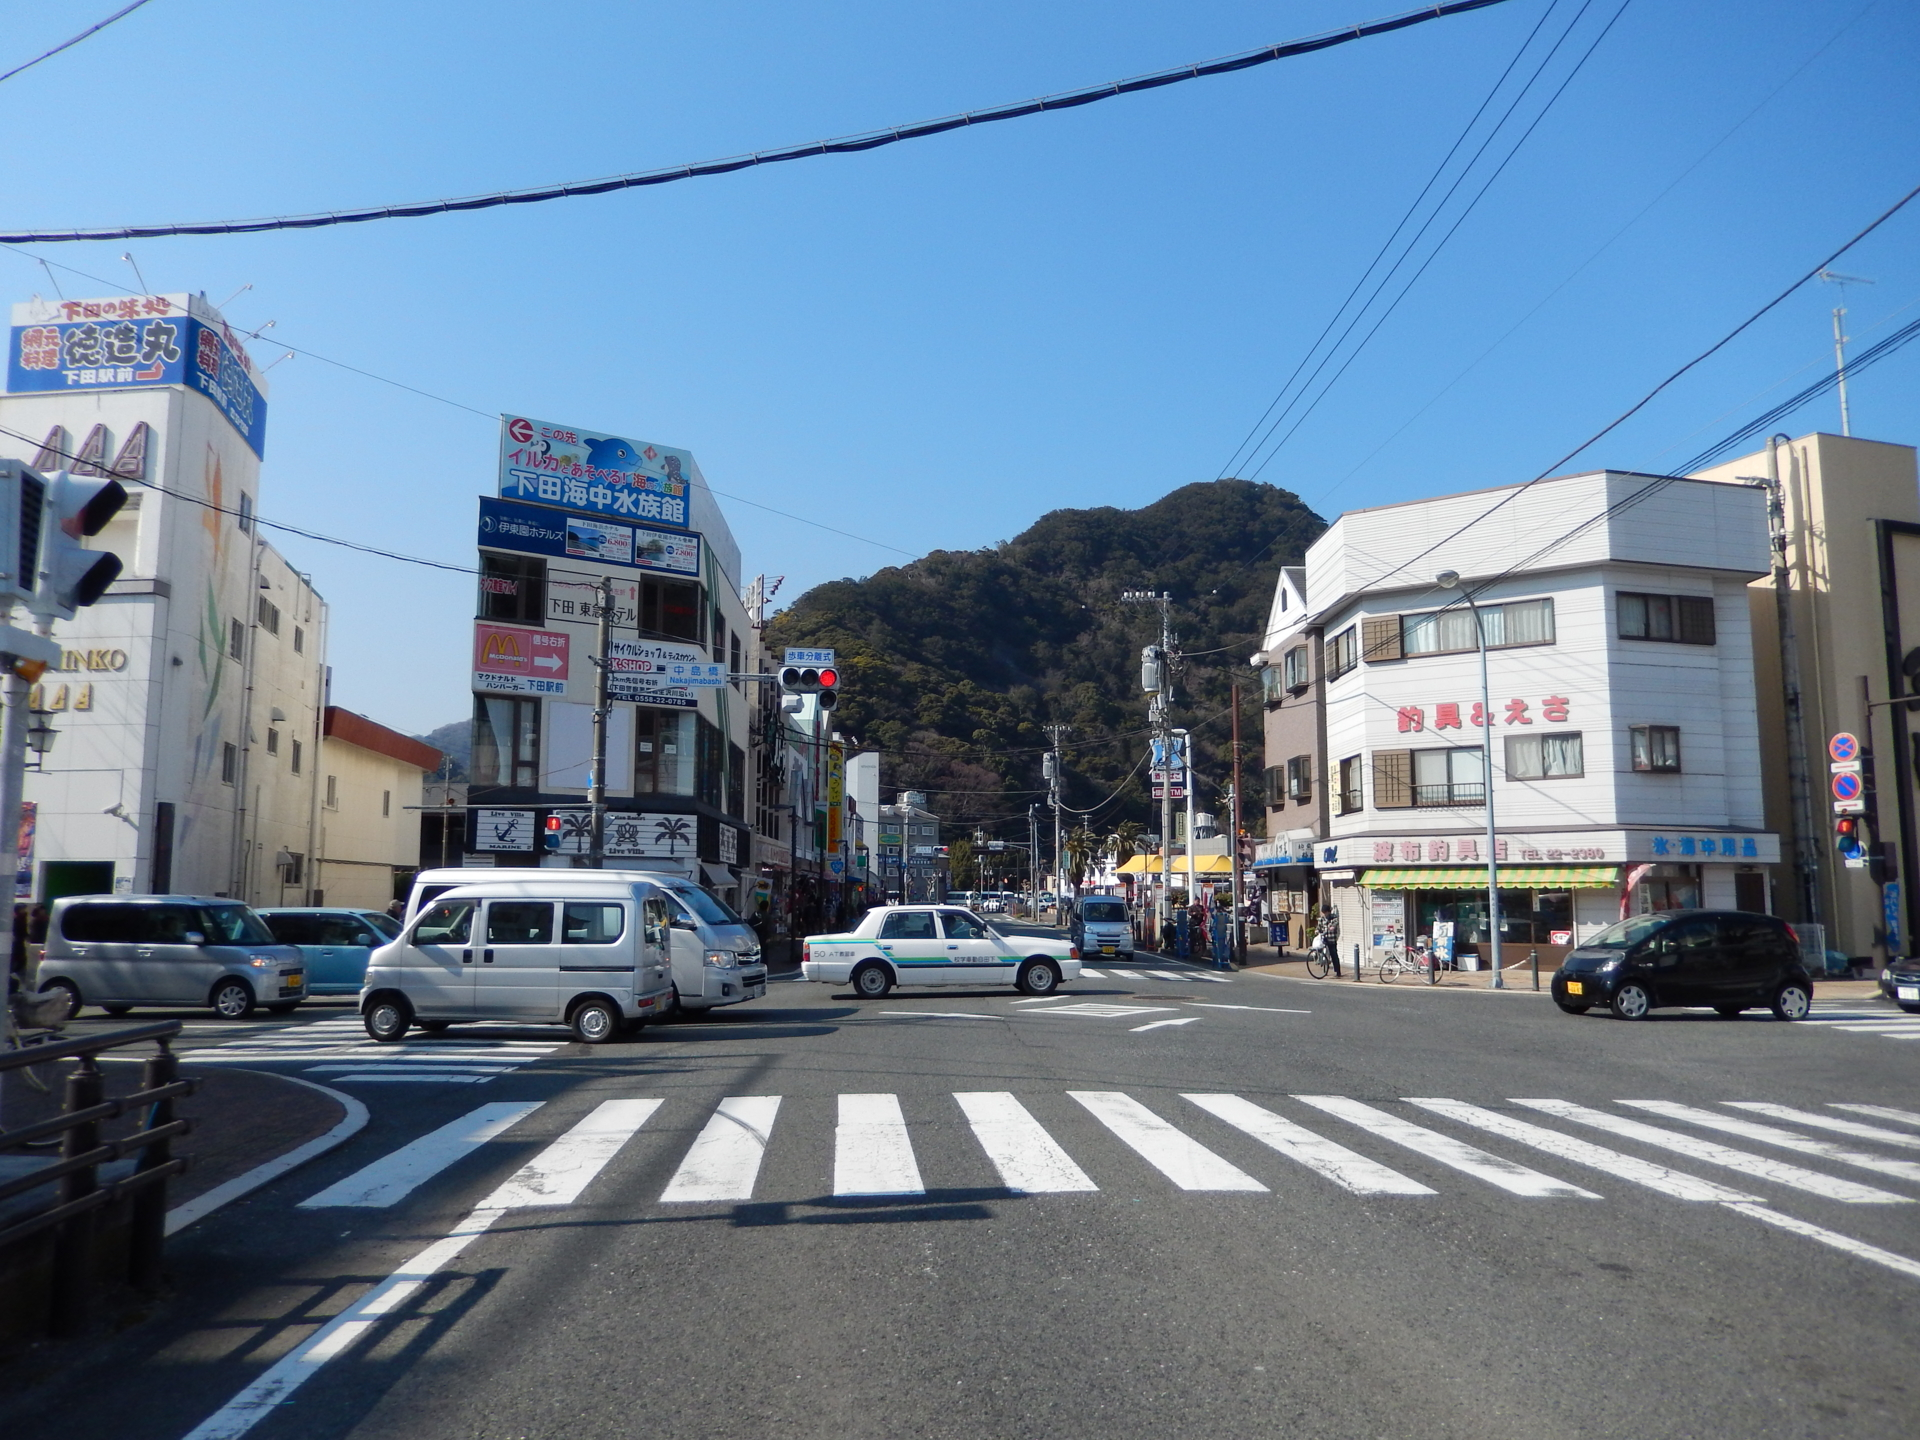 f:id:ToshUeno:20150215133251j:plain